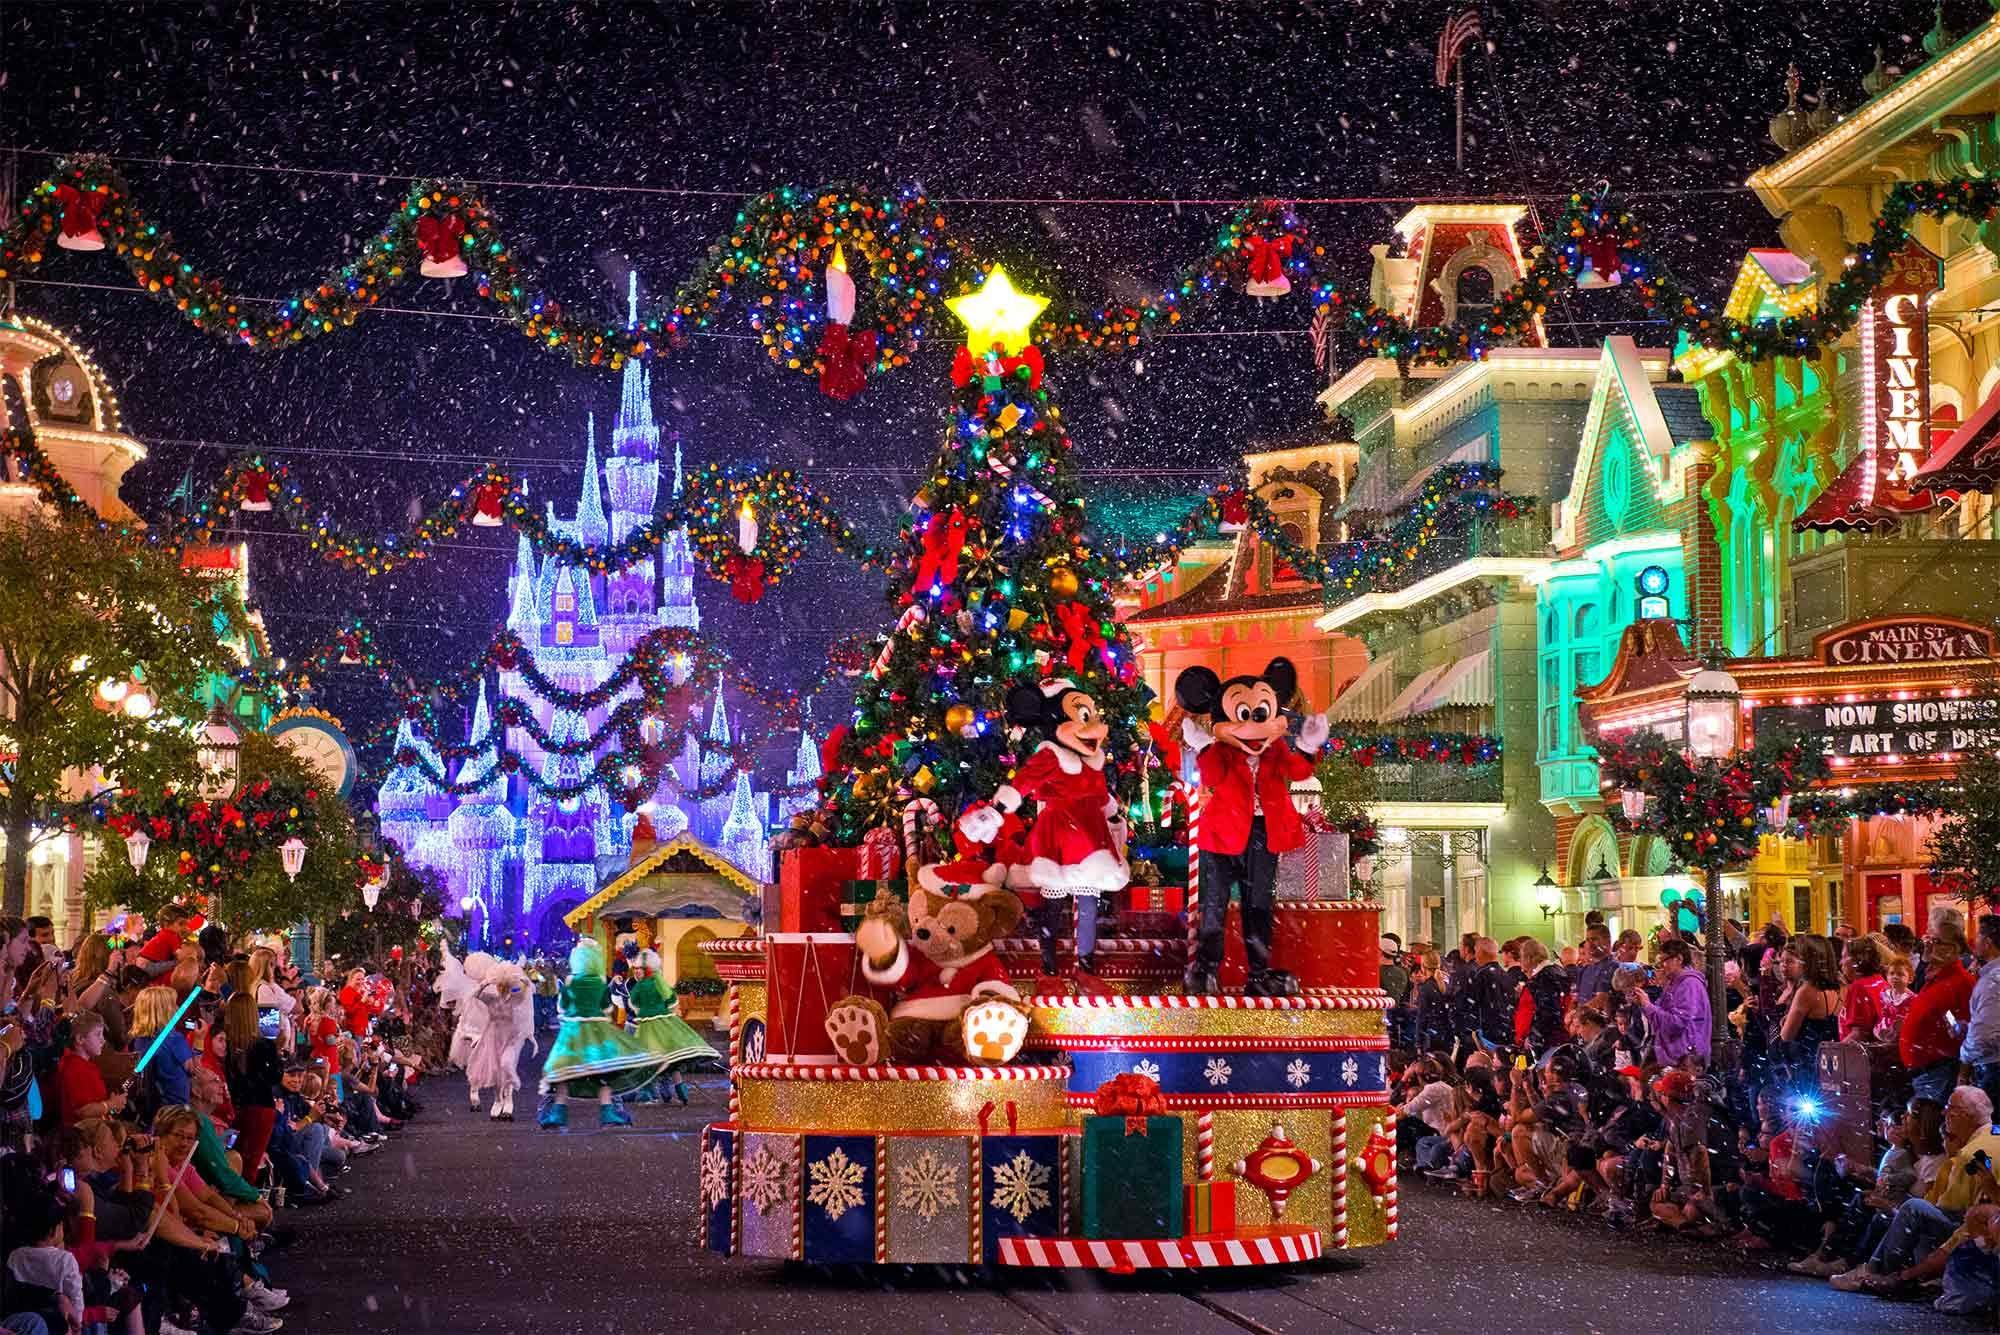 To Σάββατο ,15 Δεκεμβρίου, η μεγάλη Χριστουγεννιάτικη παρέλαση της πόλης